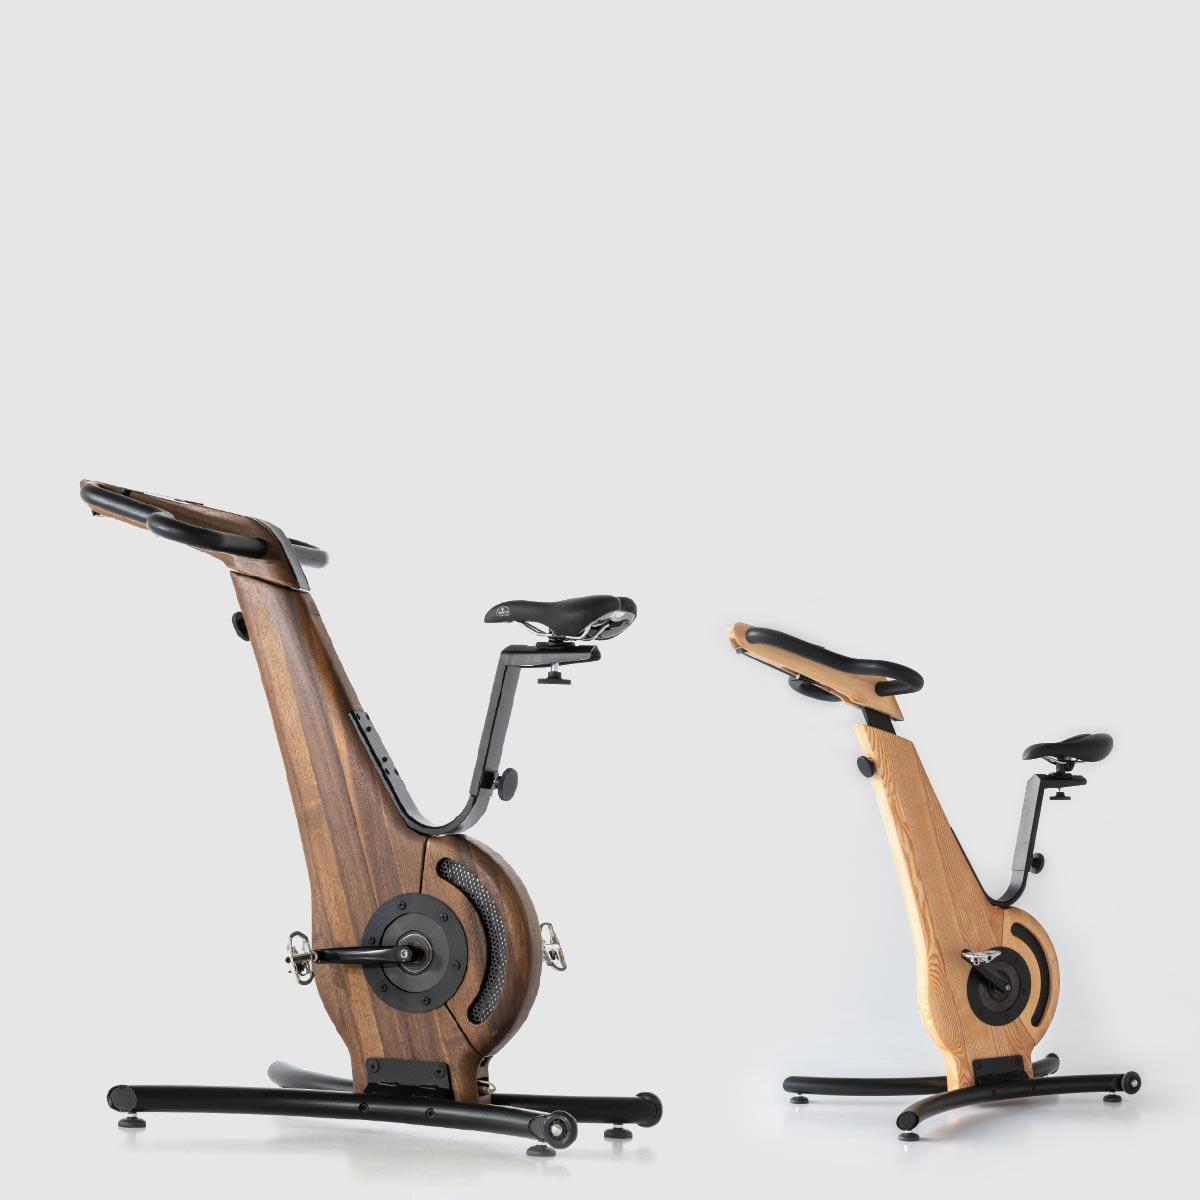 Surprising Nohrd Wooden Fitness Innovations Waterrower Rowing Machines Machost Co Dining Chair Design Ideas Machostcouk